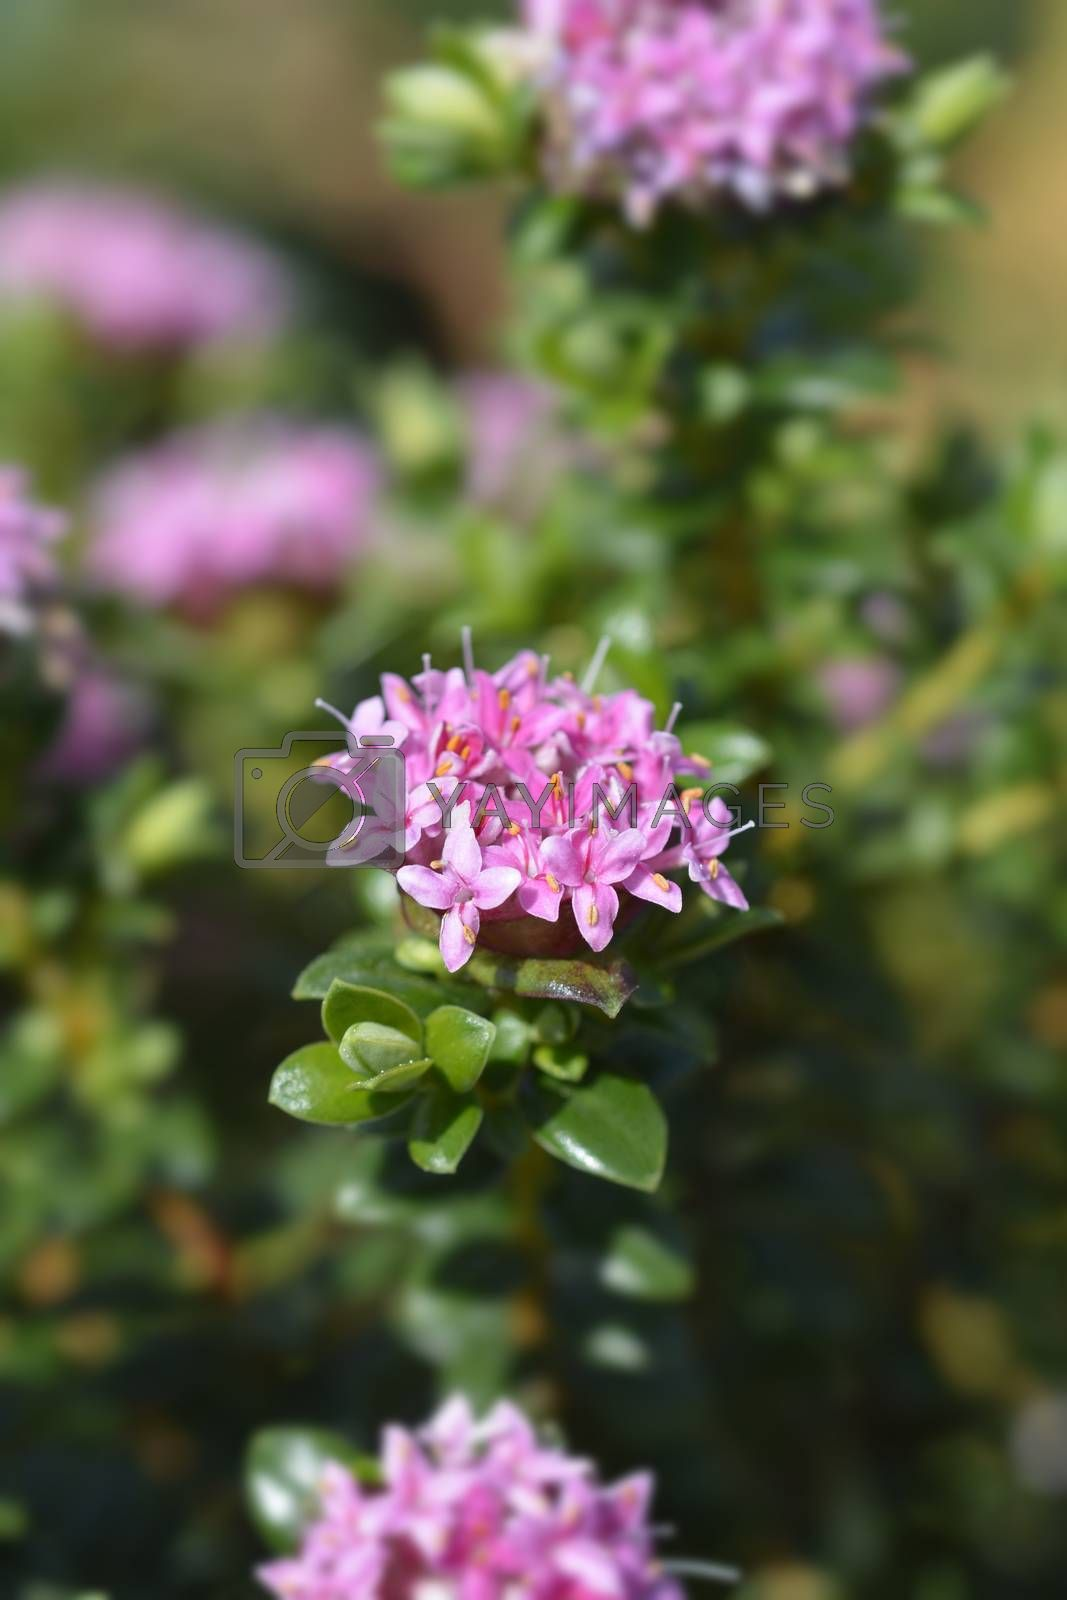 Rosy rice flower - Latin name - Pimelea ferruginea